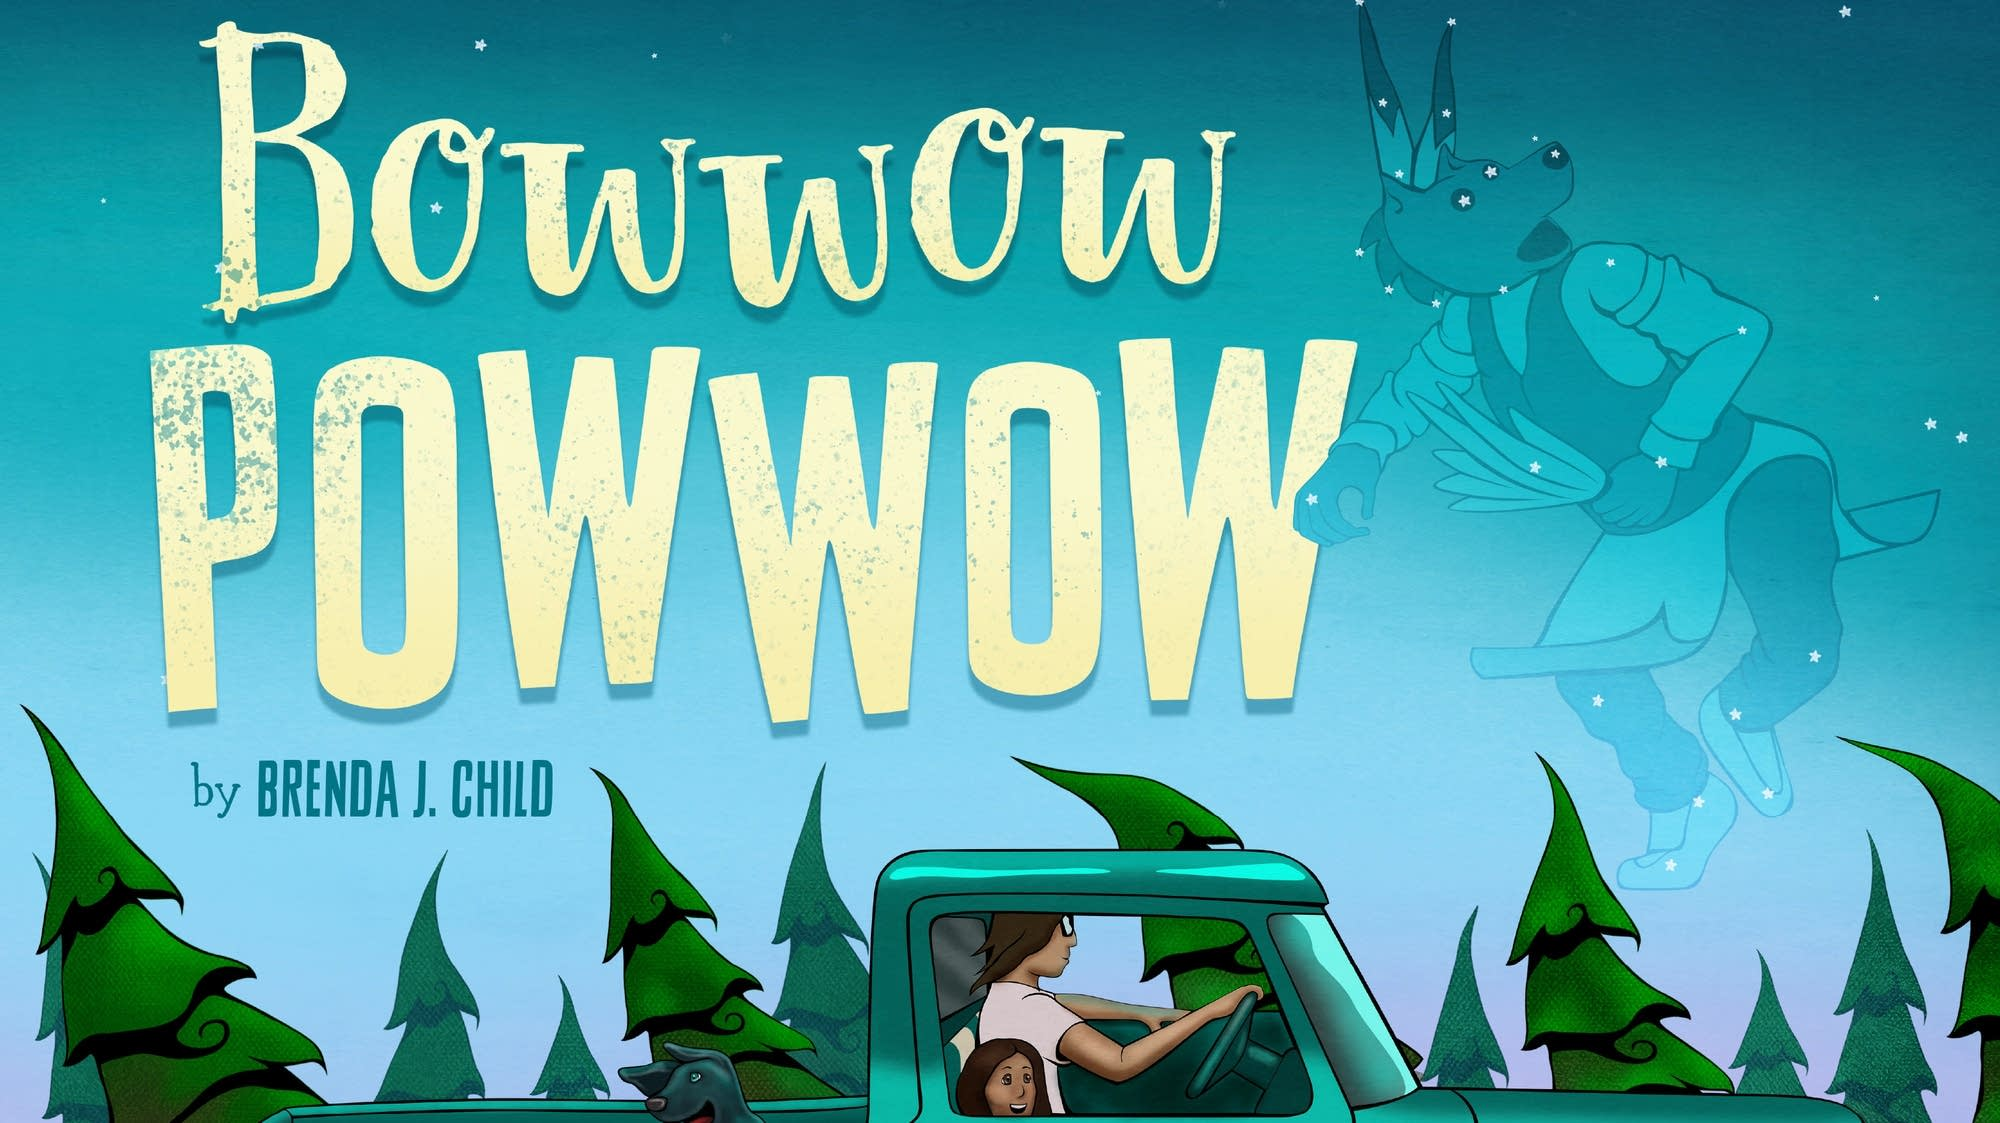 Bowwow Powwow, a new children's book by Brenda Child